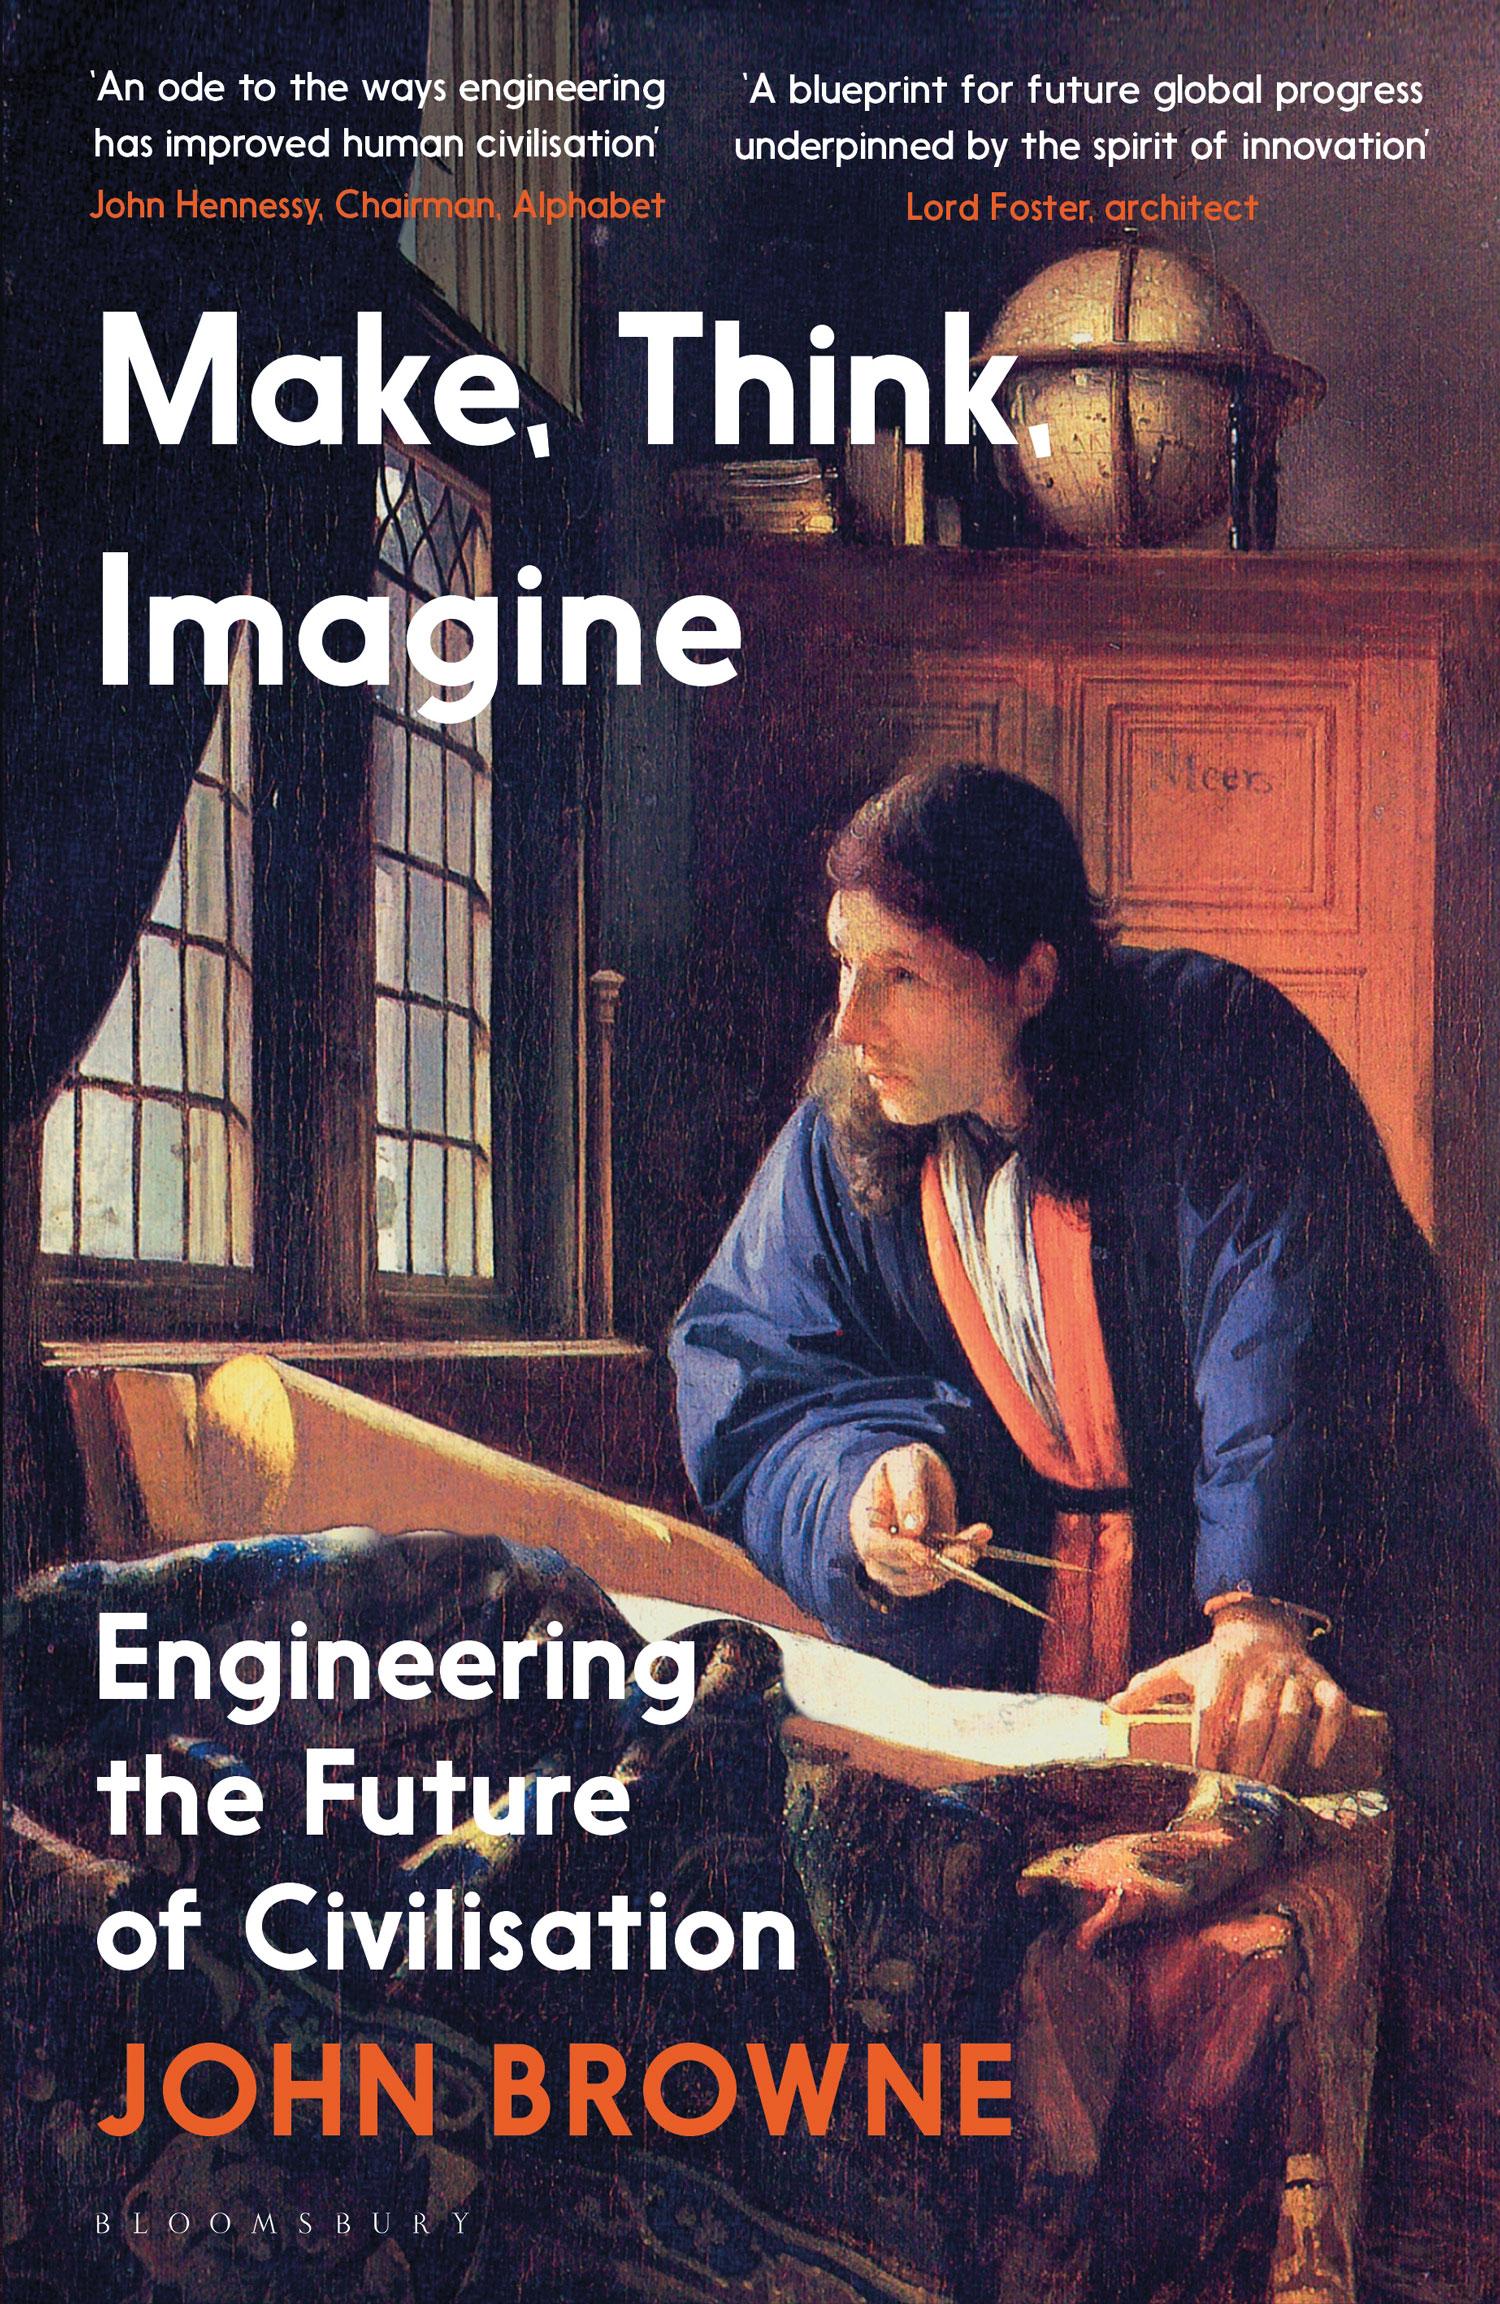 Make, Think, Imagine book cover